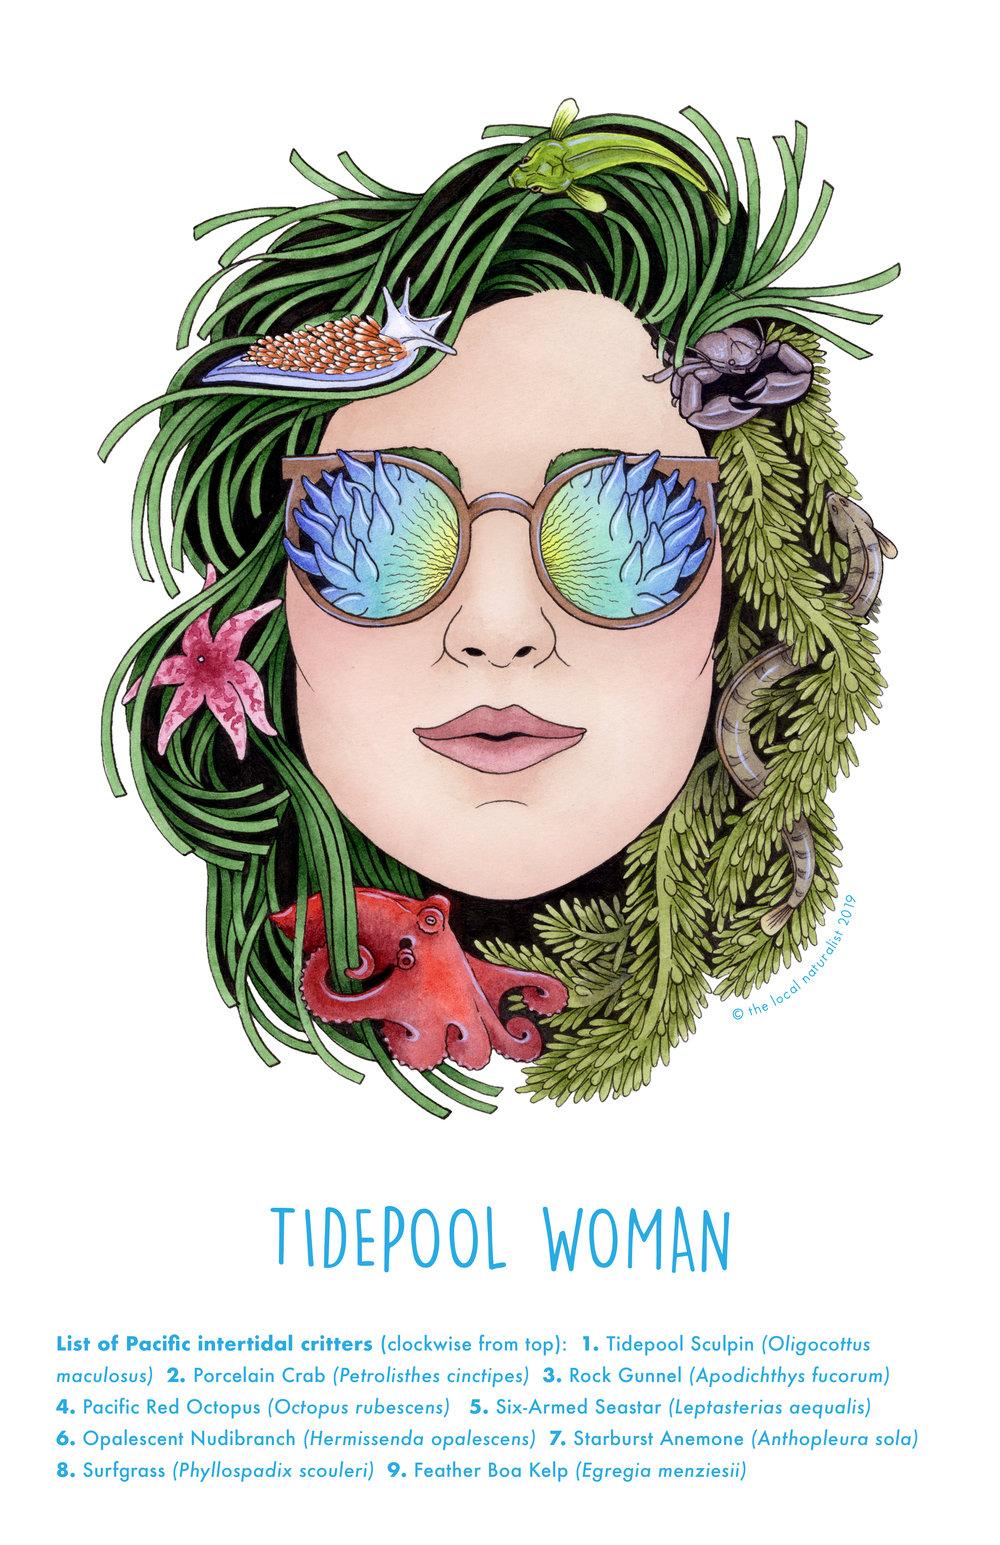 Tidepool Woman